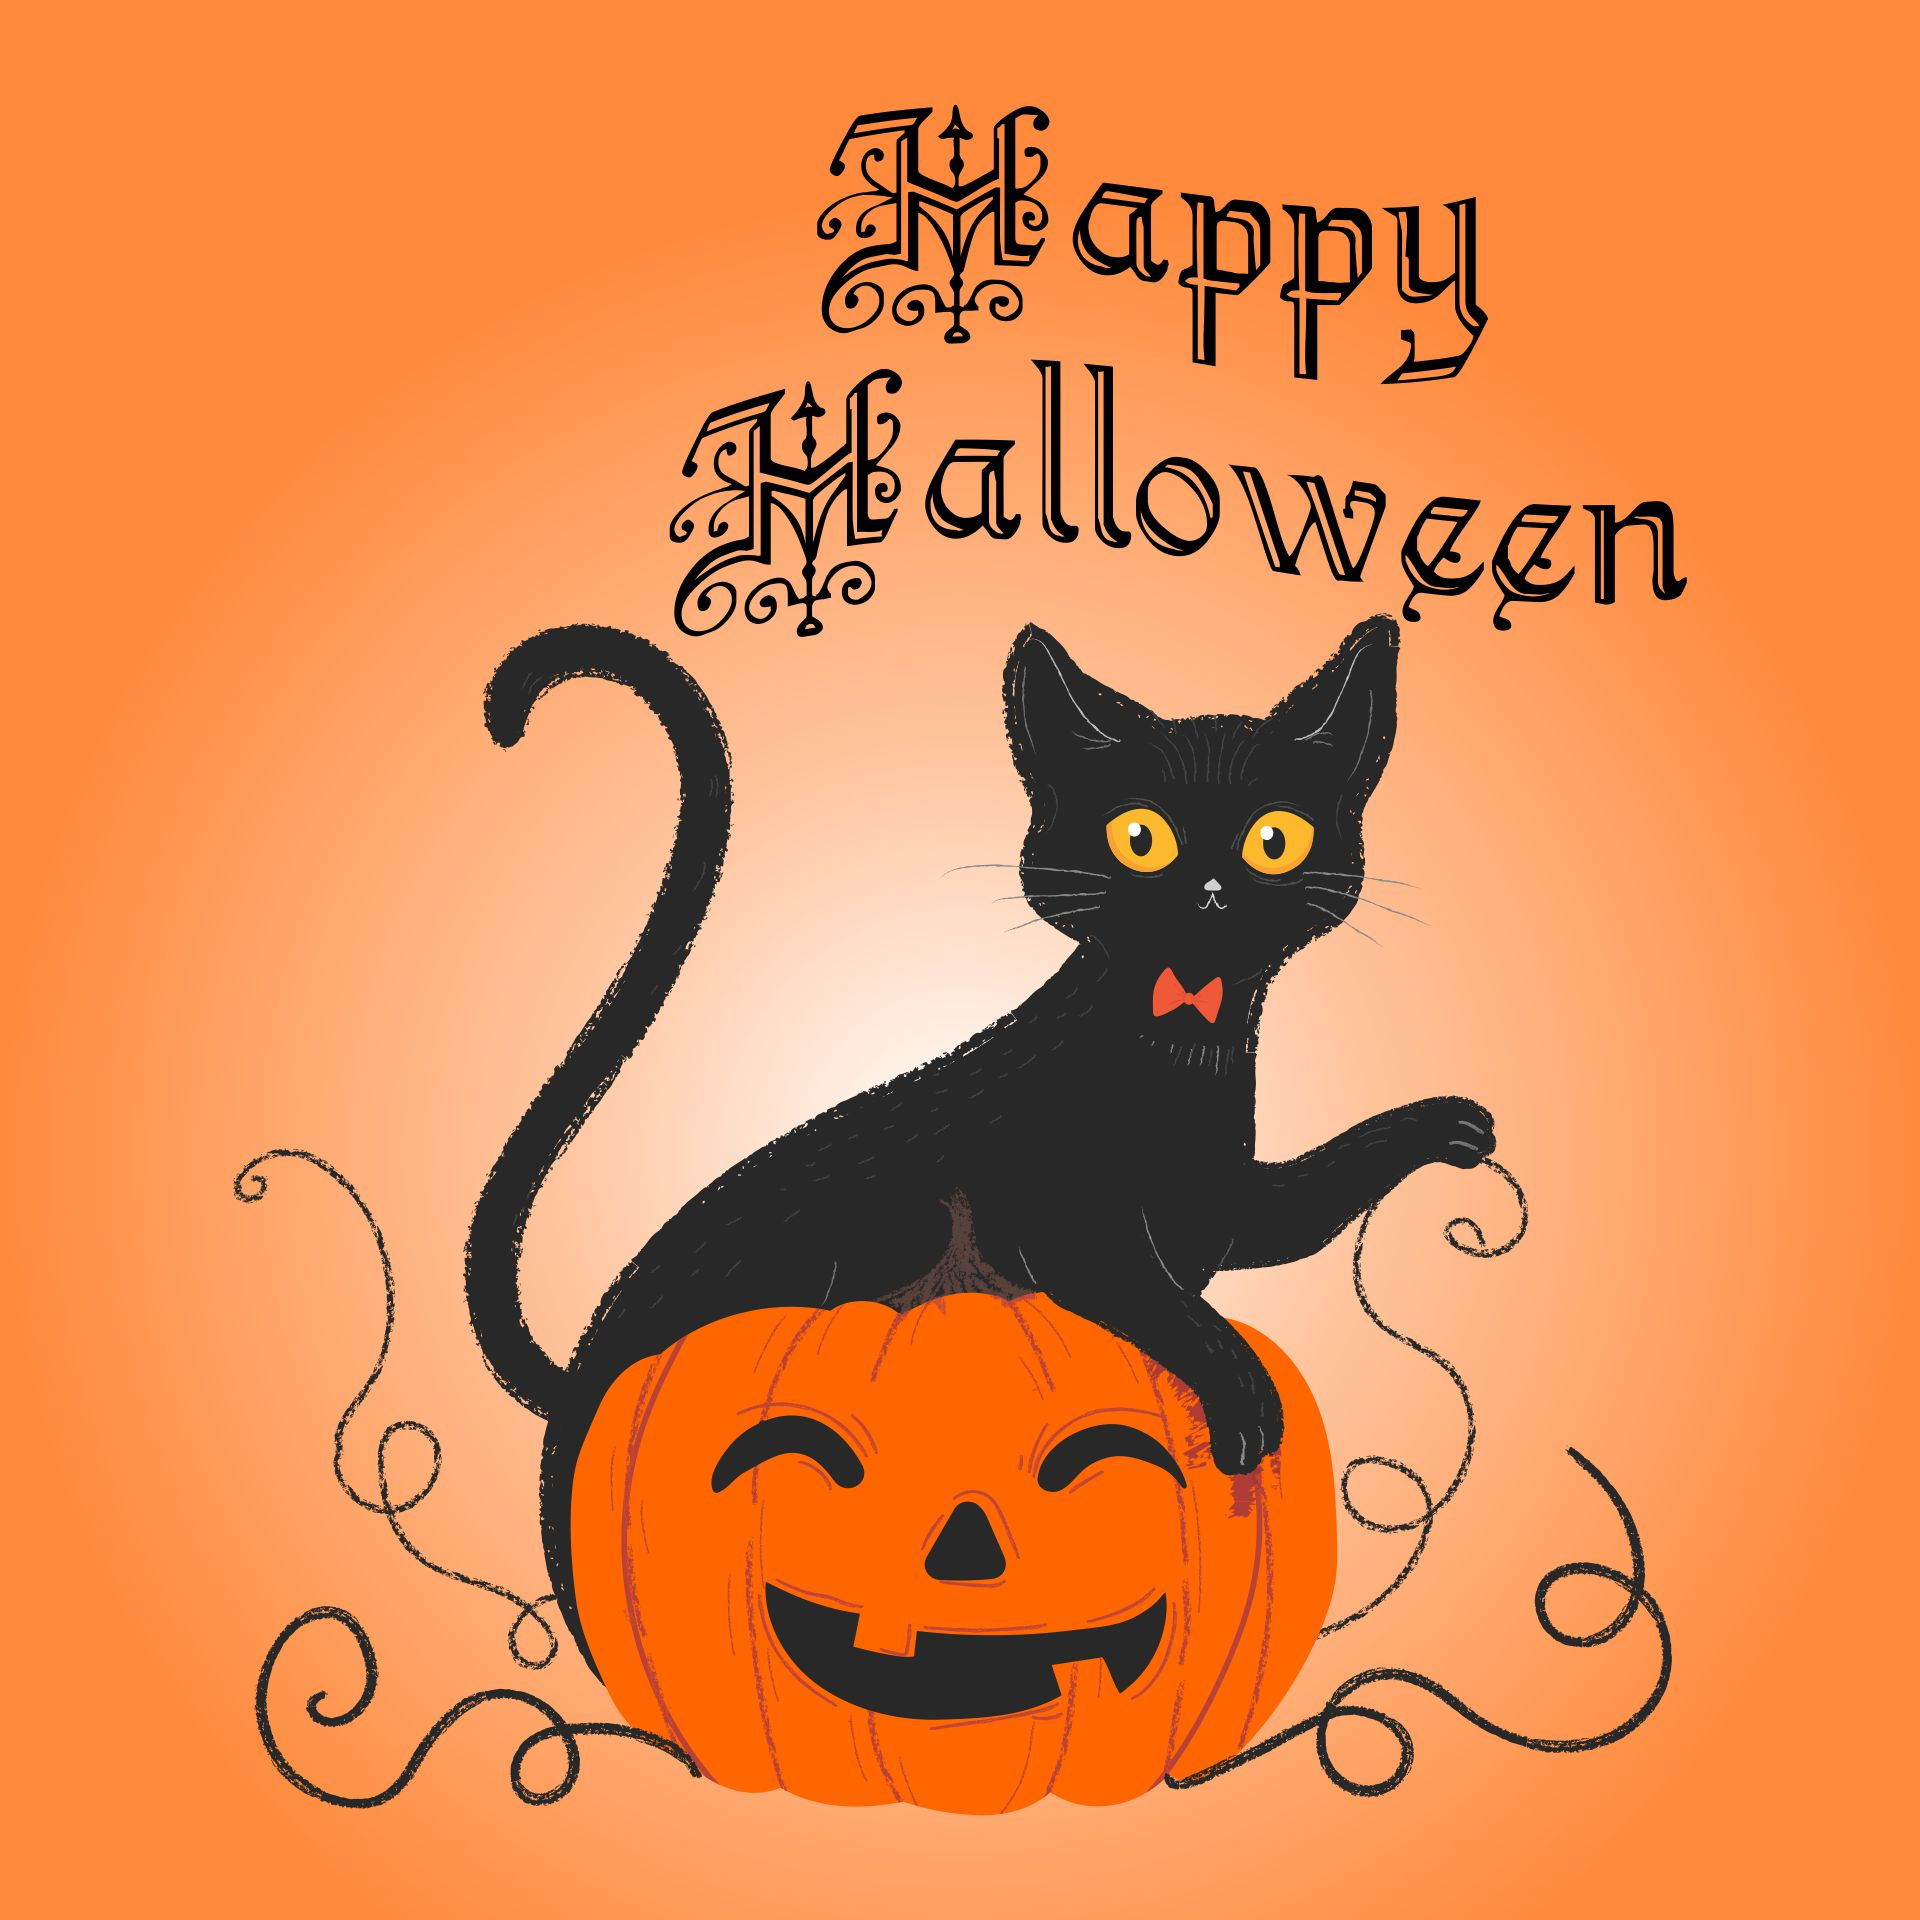 Halloween Printables The Graphics Fairy